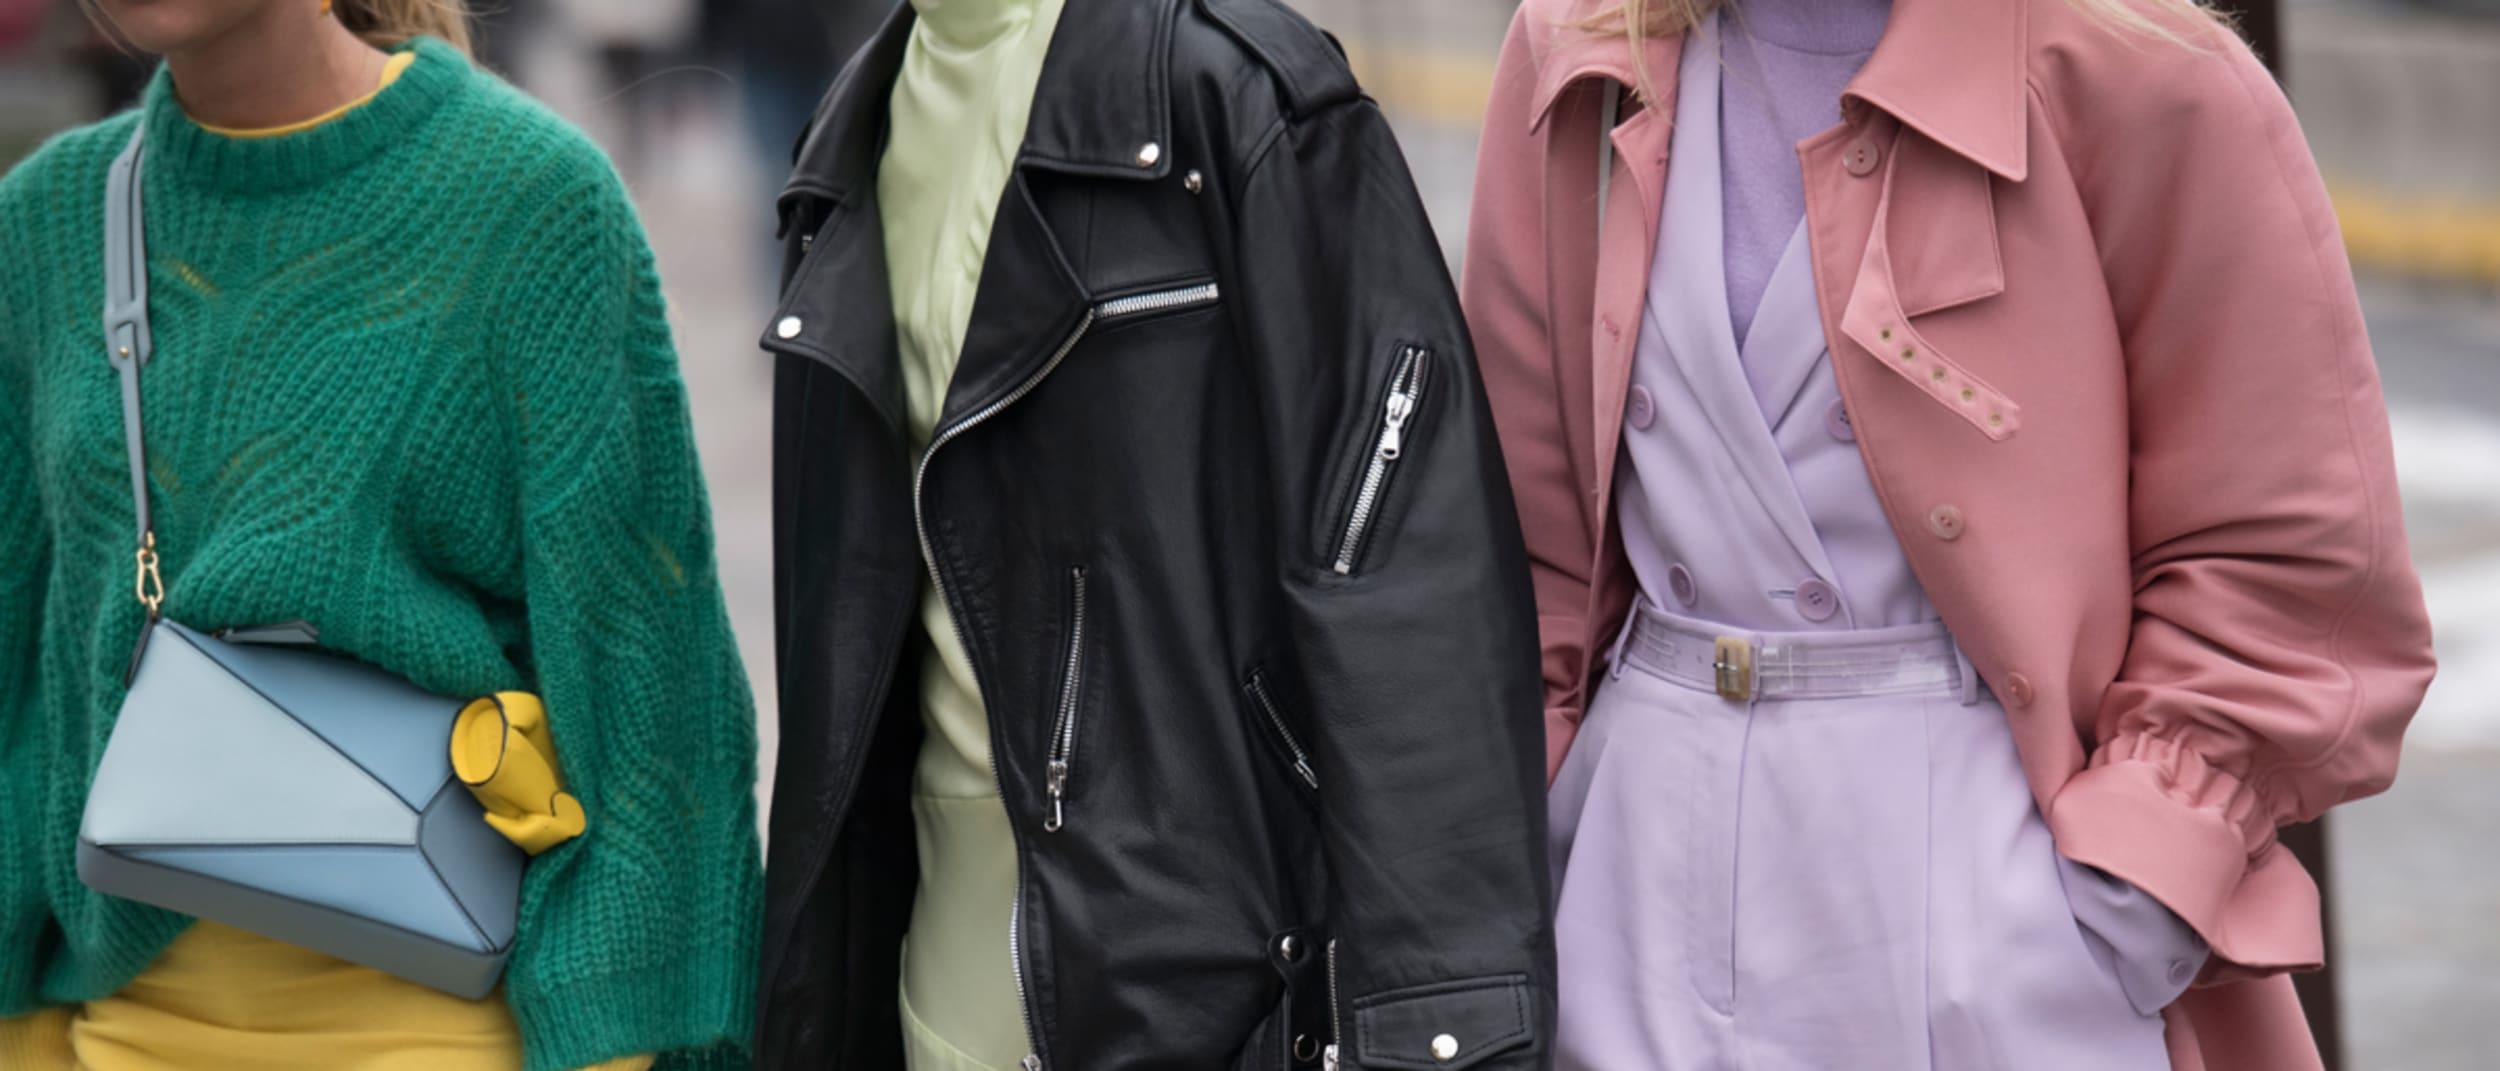 Between seasons: how to style transeasonal jackets